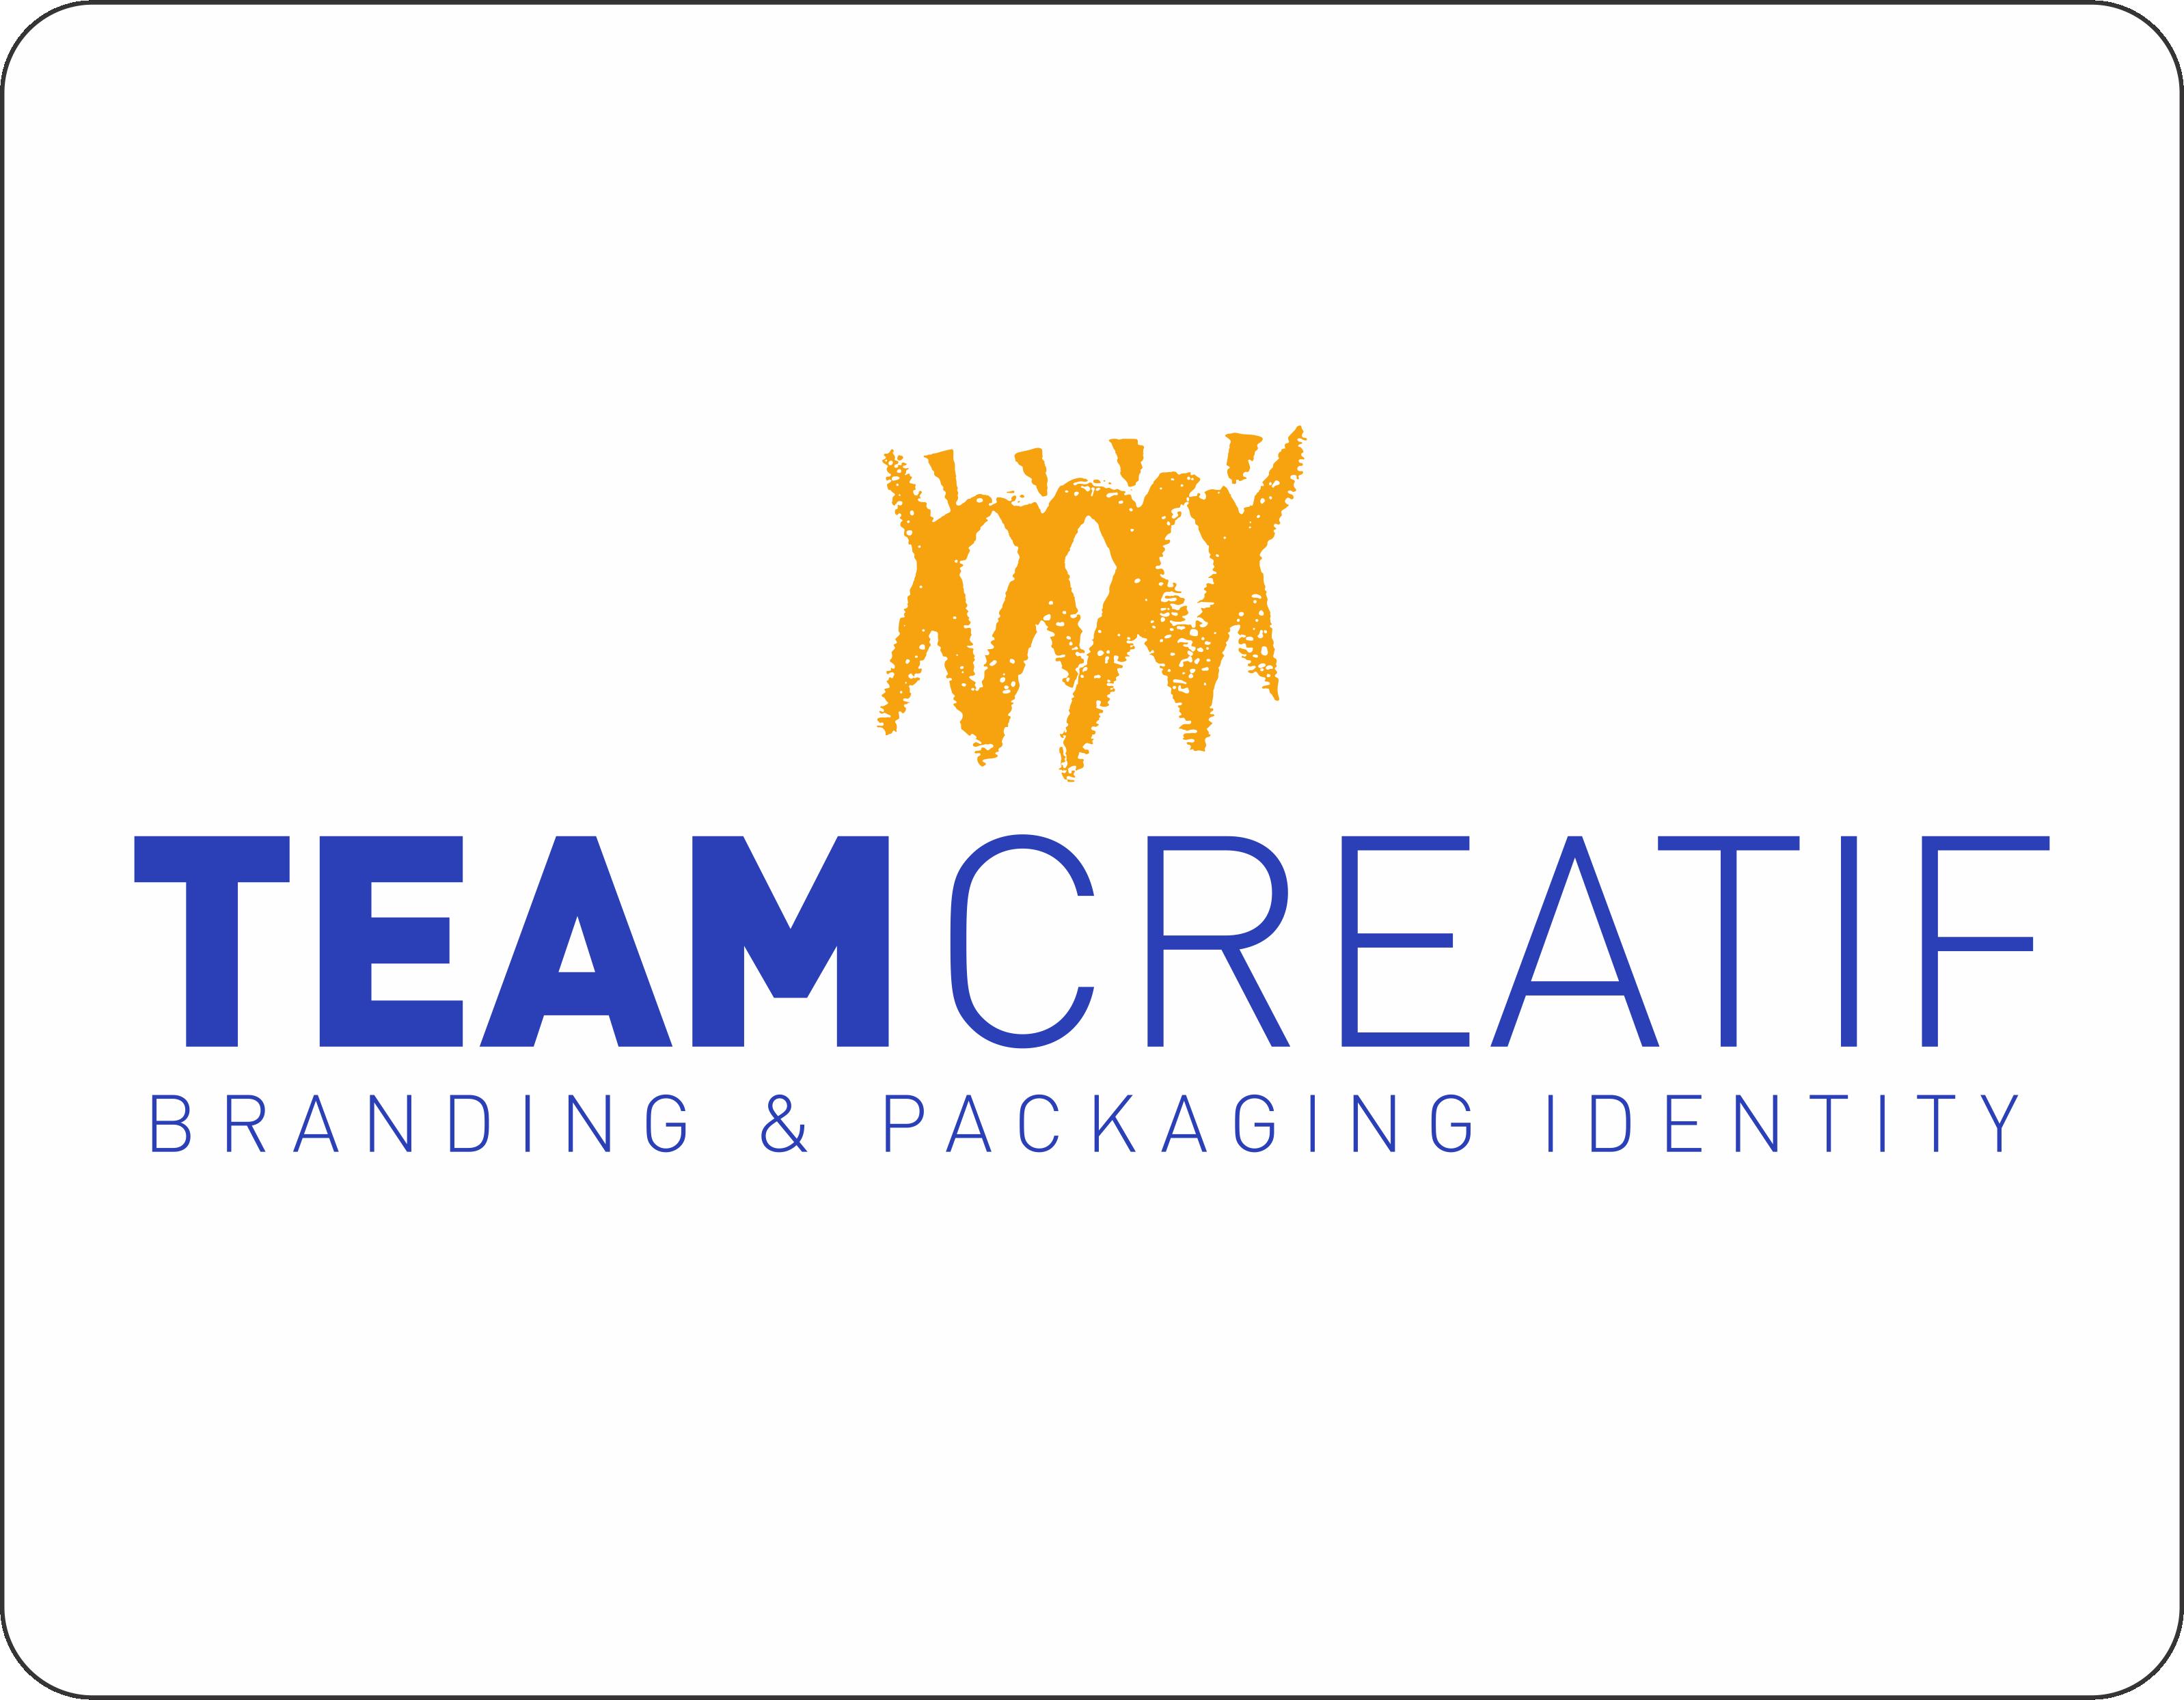 Team Creatif